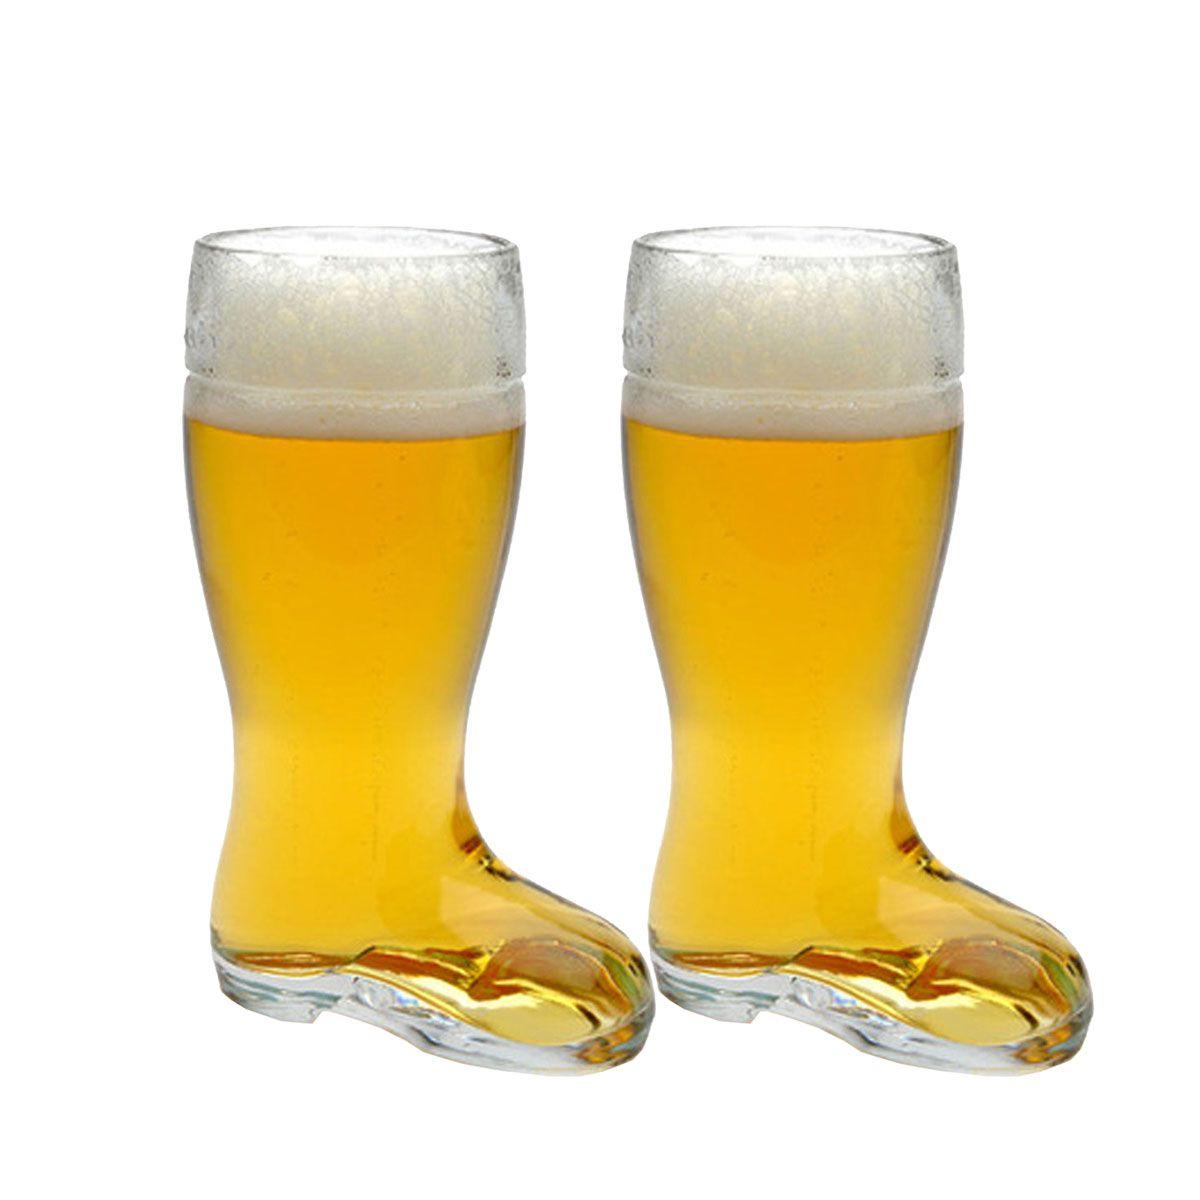 Copo Bota Cerveja Chopp Vidro Formato Stiefel M 620ml kit c/ 02